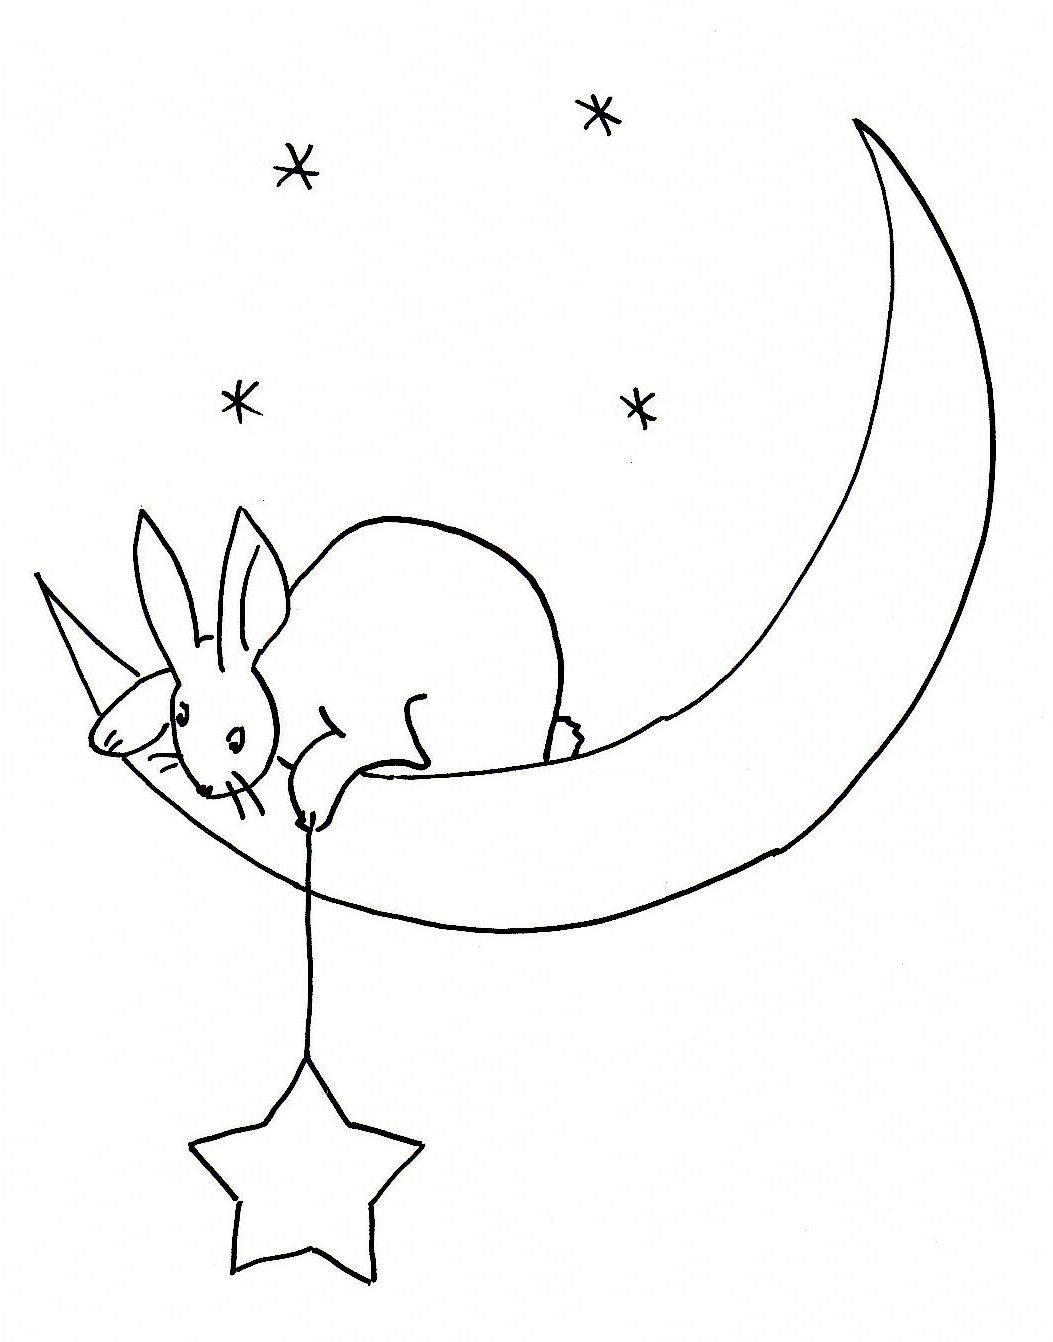 1053x1342 Pin By Jan Hardy On Sunny Morning Or Night Night Moon